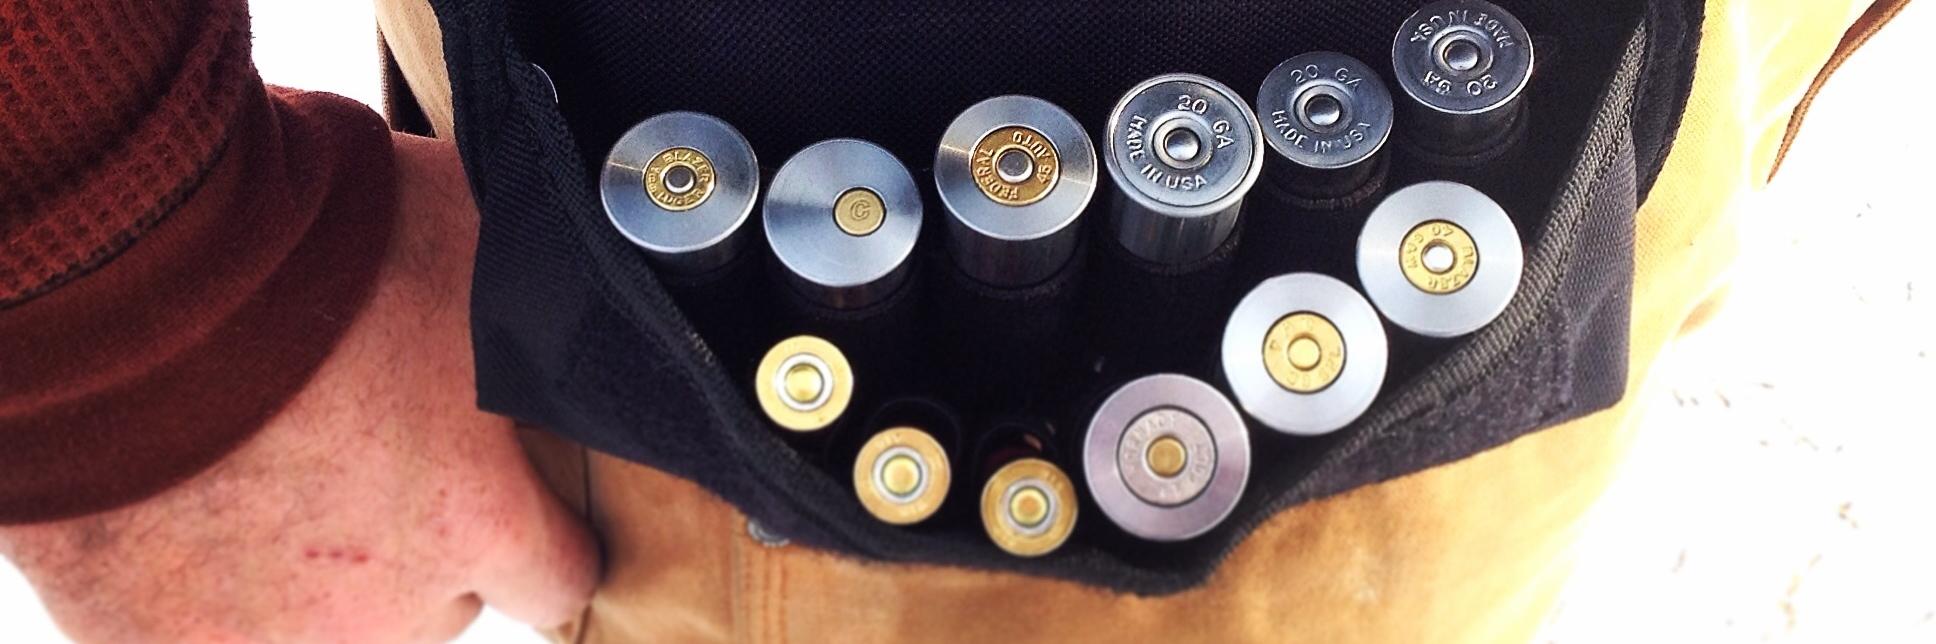 SALE 12 Gauge Scavenger Kit - Now $129.99 - Buy Now!